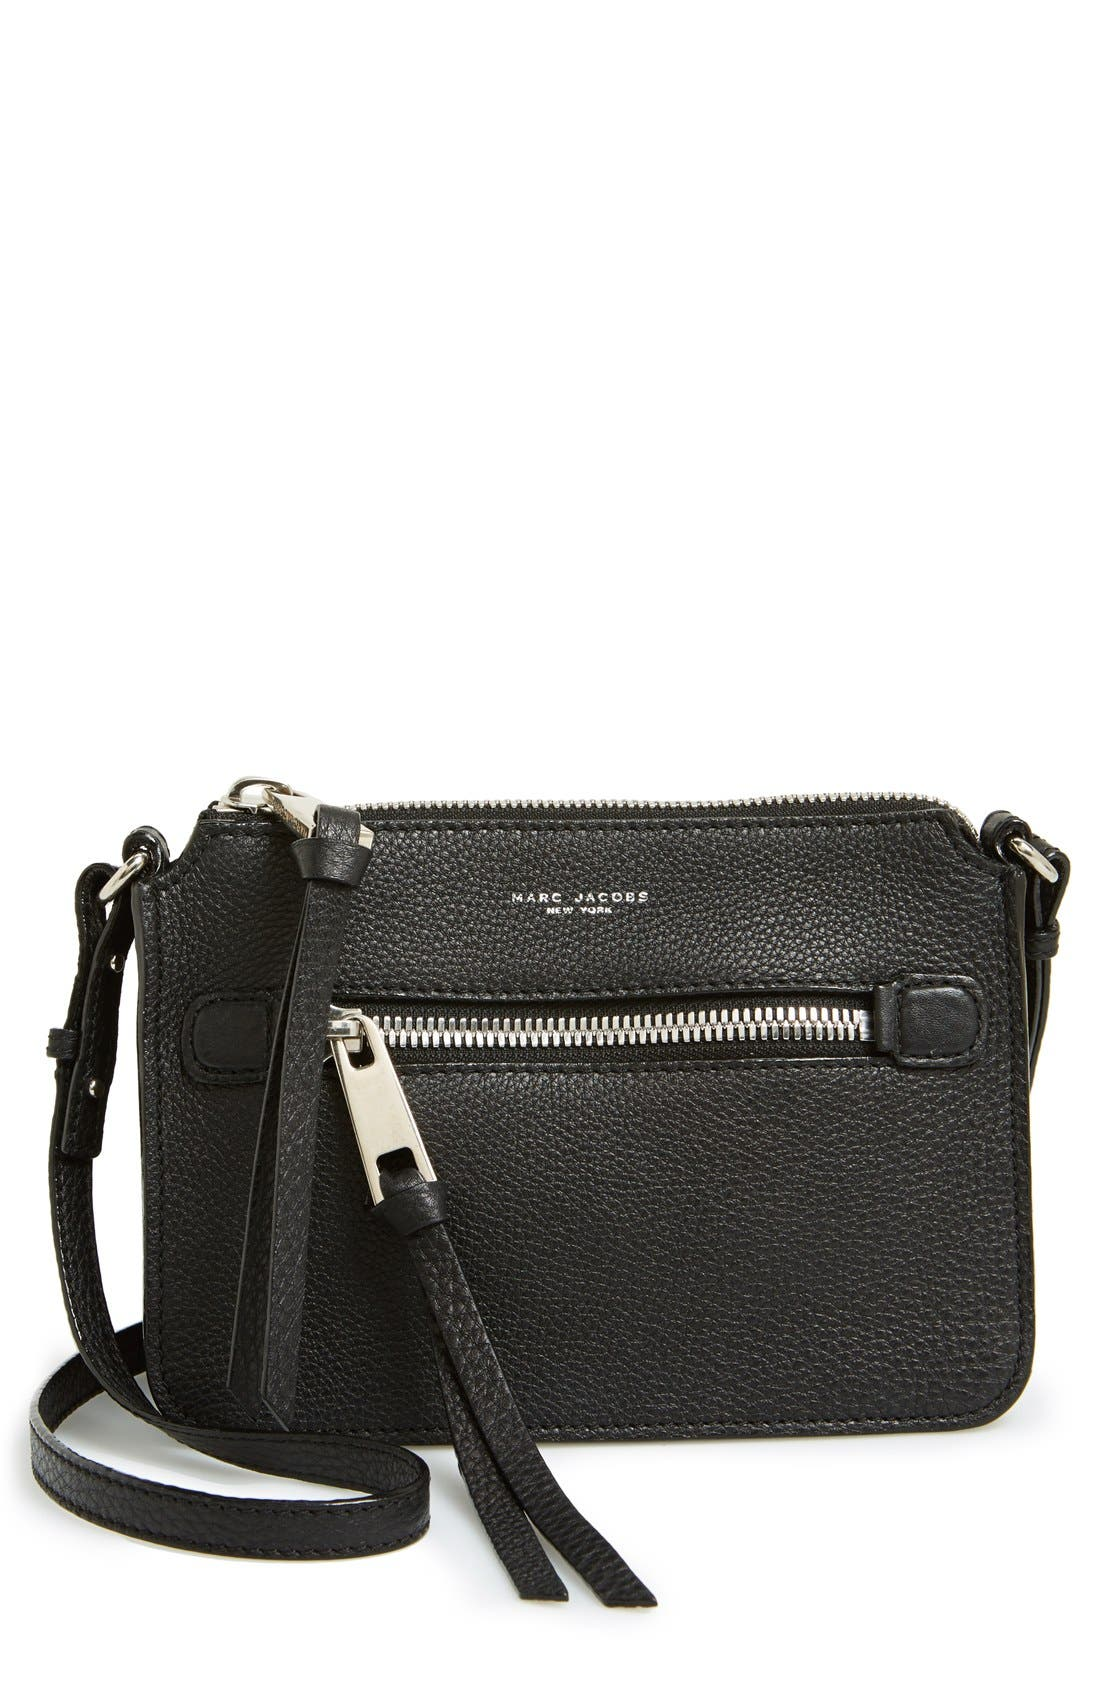 Alternate Image 1 Selected - MARC JACOBS 'Big Apple' Pouchette Crossbody Bag